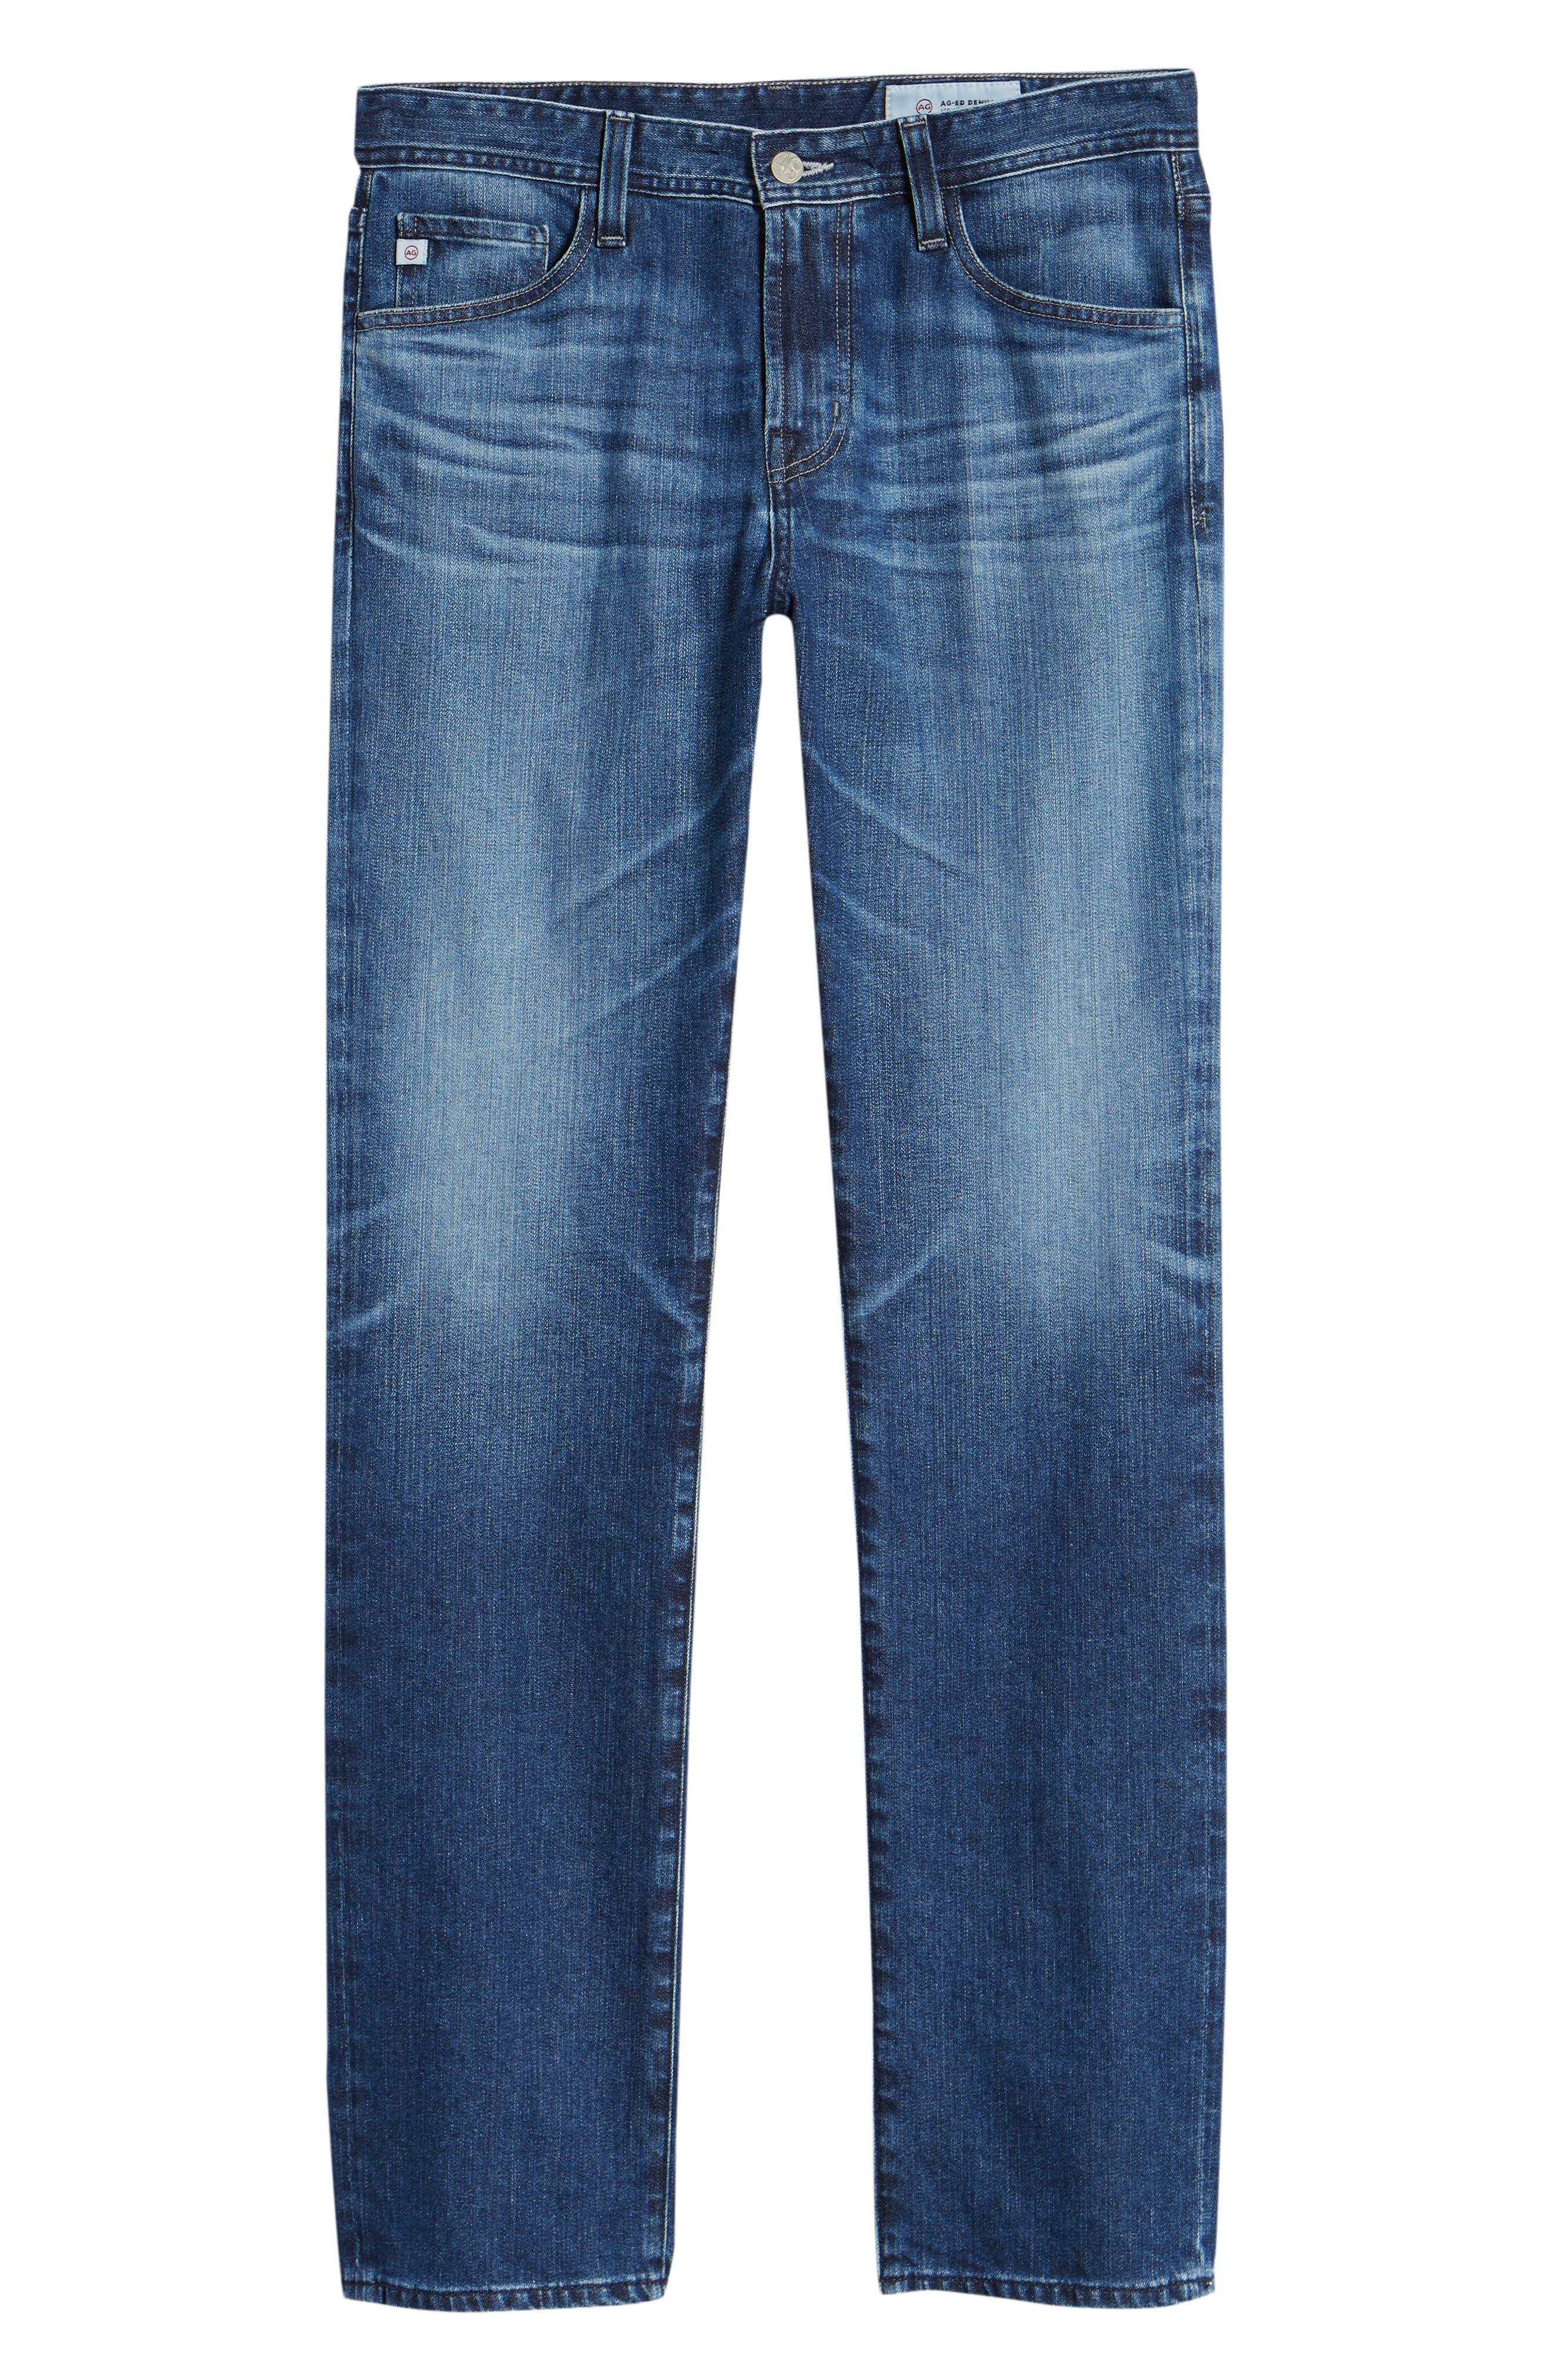 Everett Slim Straight Leg Jeans,                             Alternate thumbnail 6, color,                             9 YEARS SEQUENCE